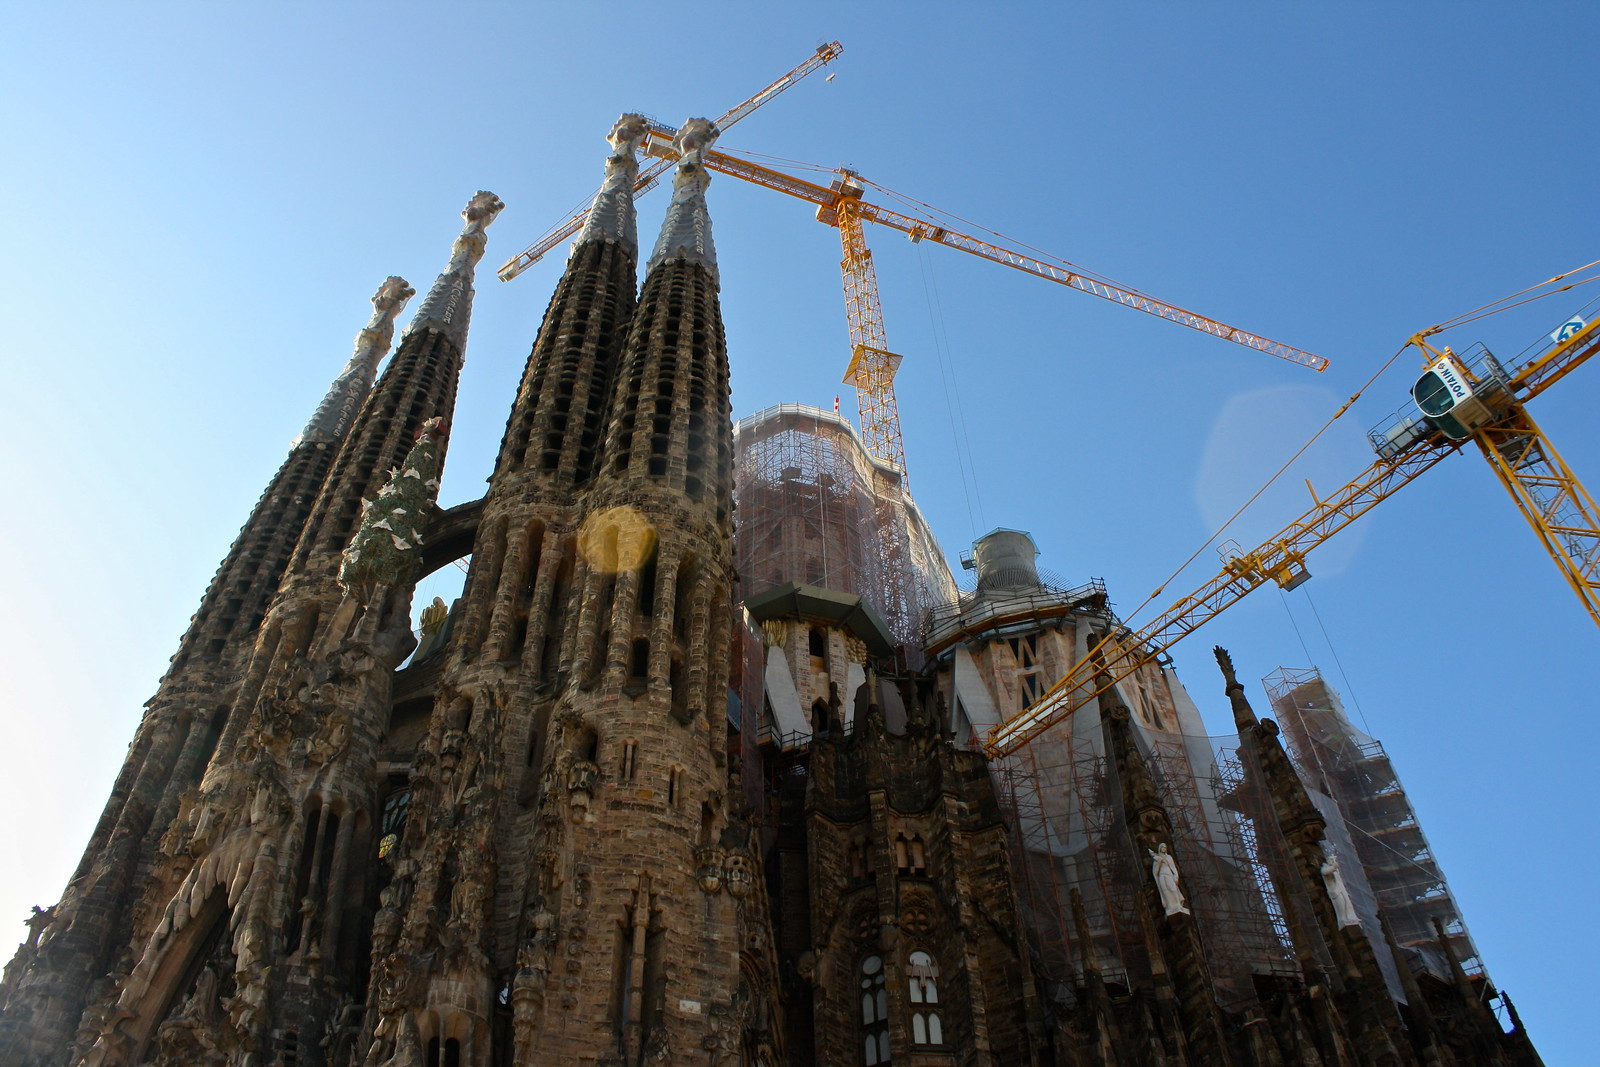 Sagrada Família by Antoni Gaudí in Barcelona, Spain